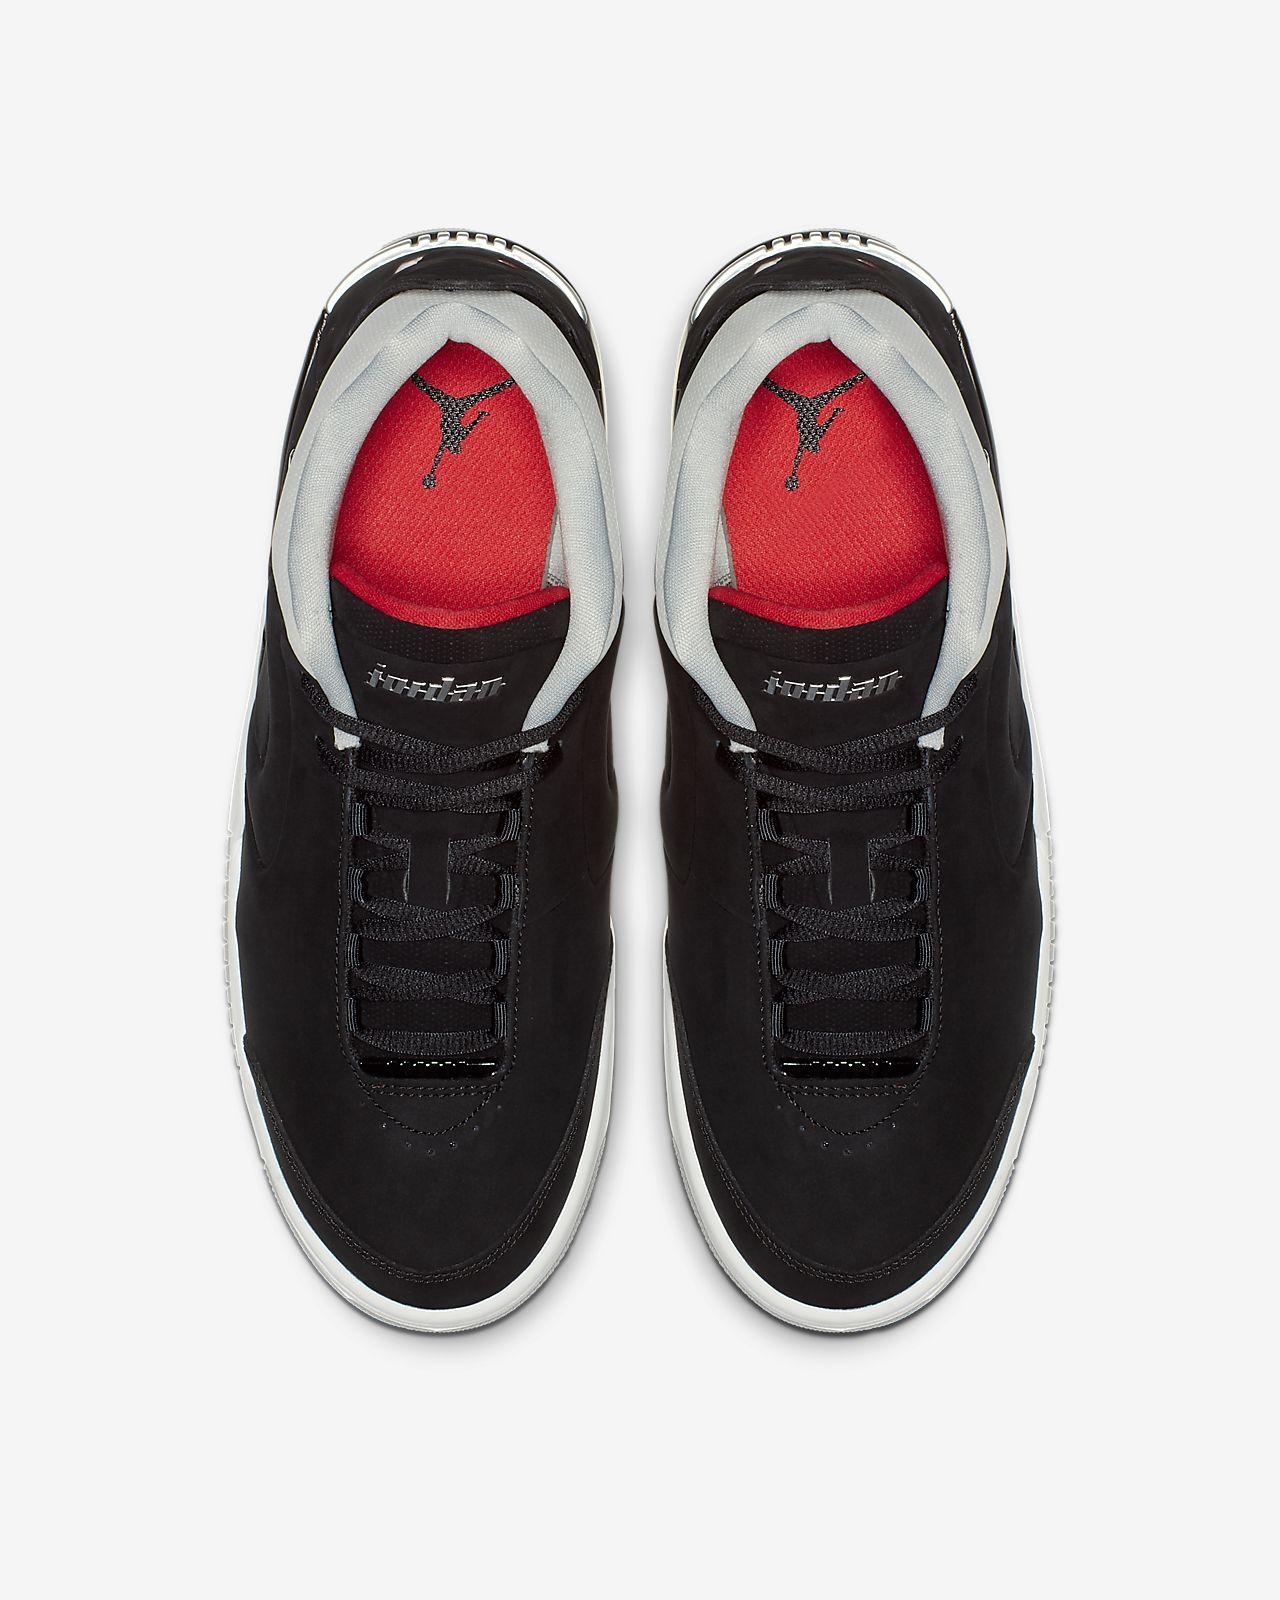 42ddfba5f3 Low Resolution Ανδρικό παπούτσι Jordan Big Fund Ανδρικό παπούτσι Jordan Big  Fund